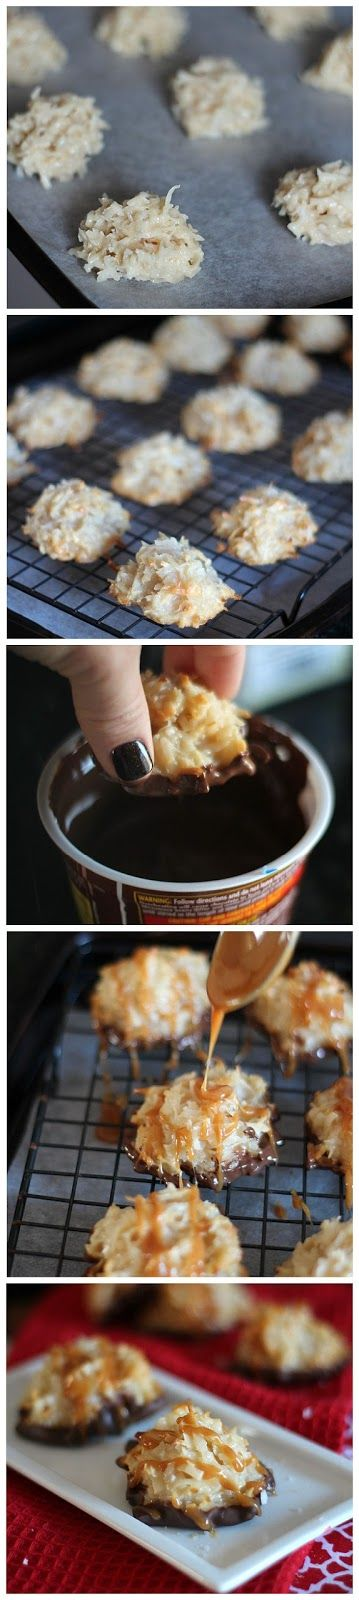 Salted Caramel Coconut Macaroons Recipe | Cookies | Pinterest